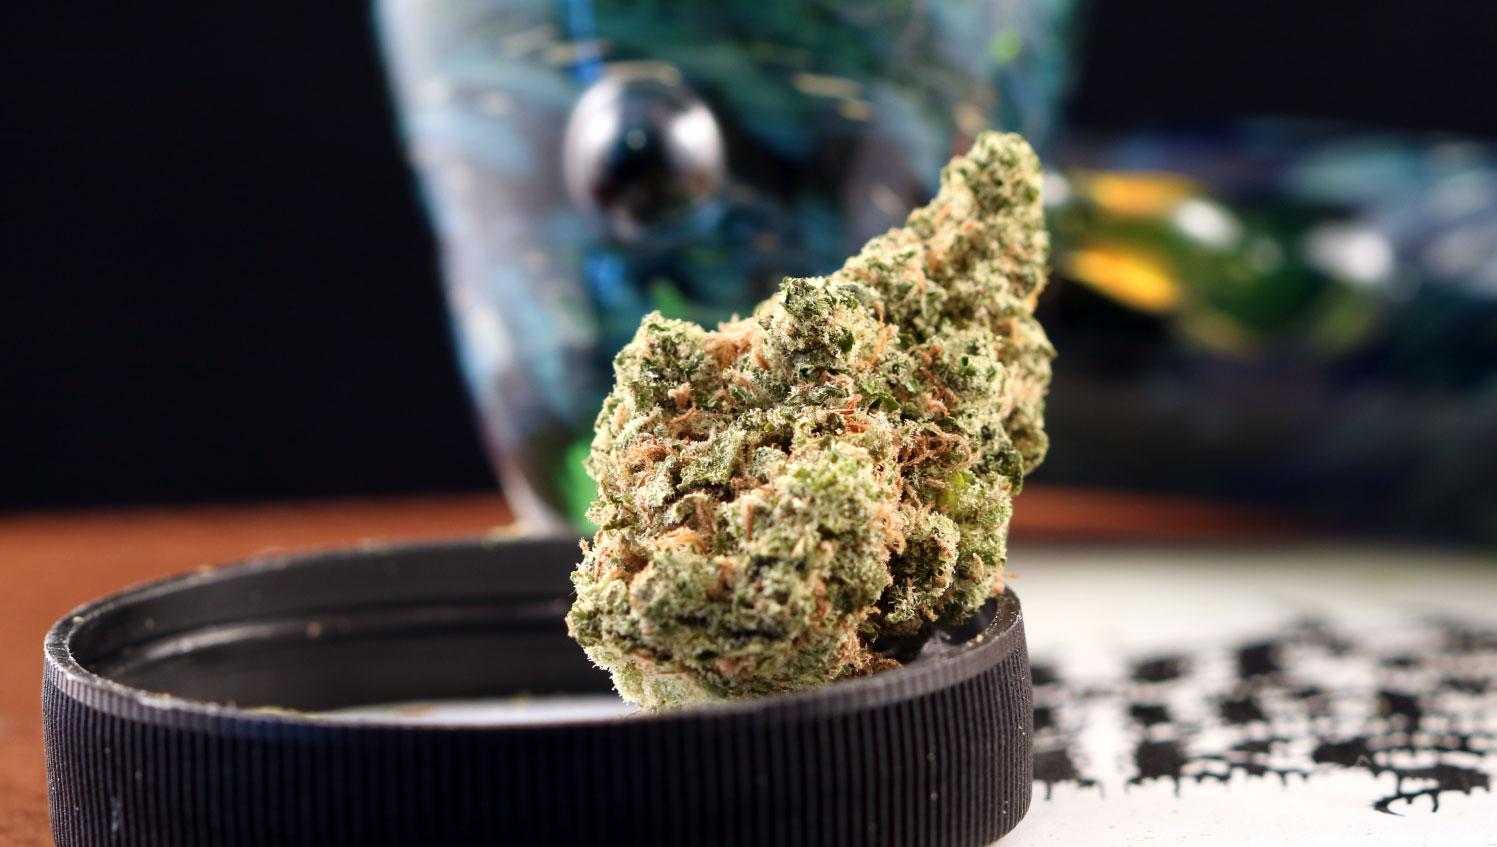 Orange Fruity Pebbles Marijuana Strain